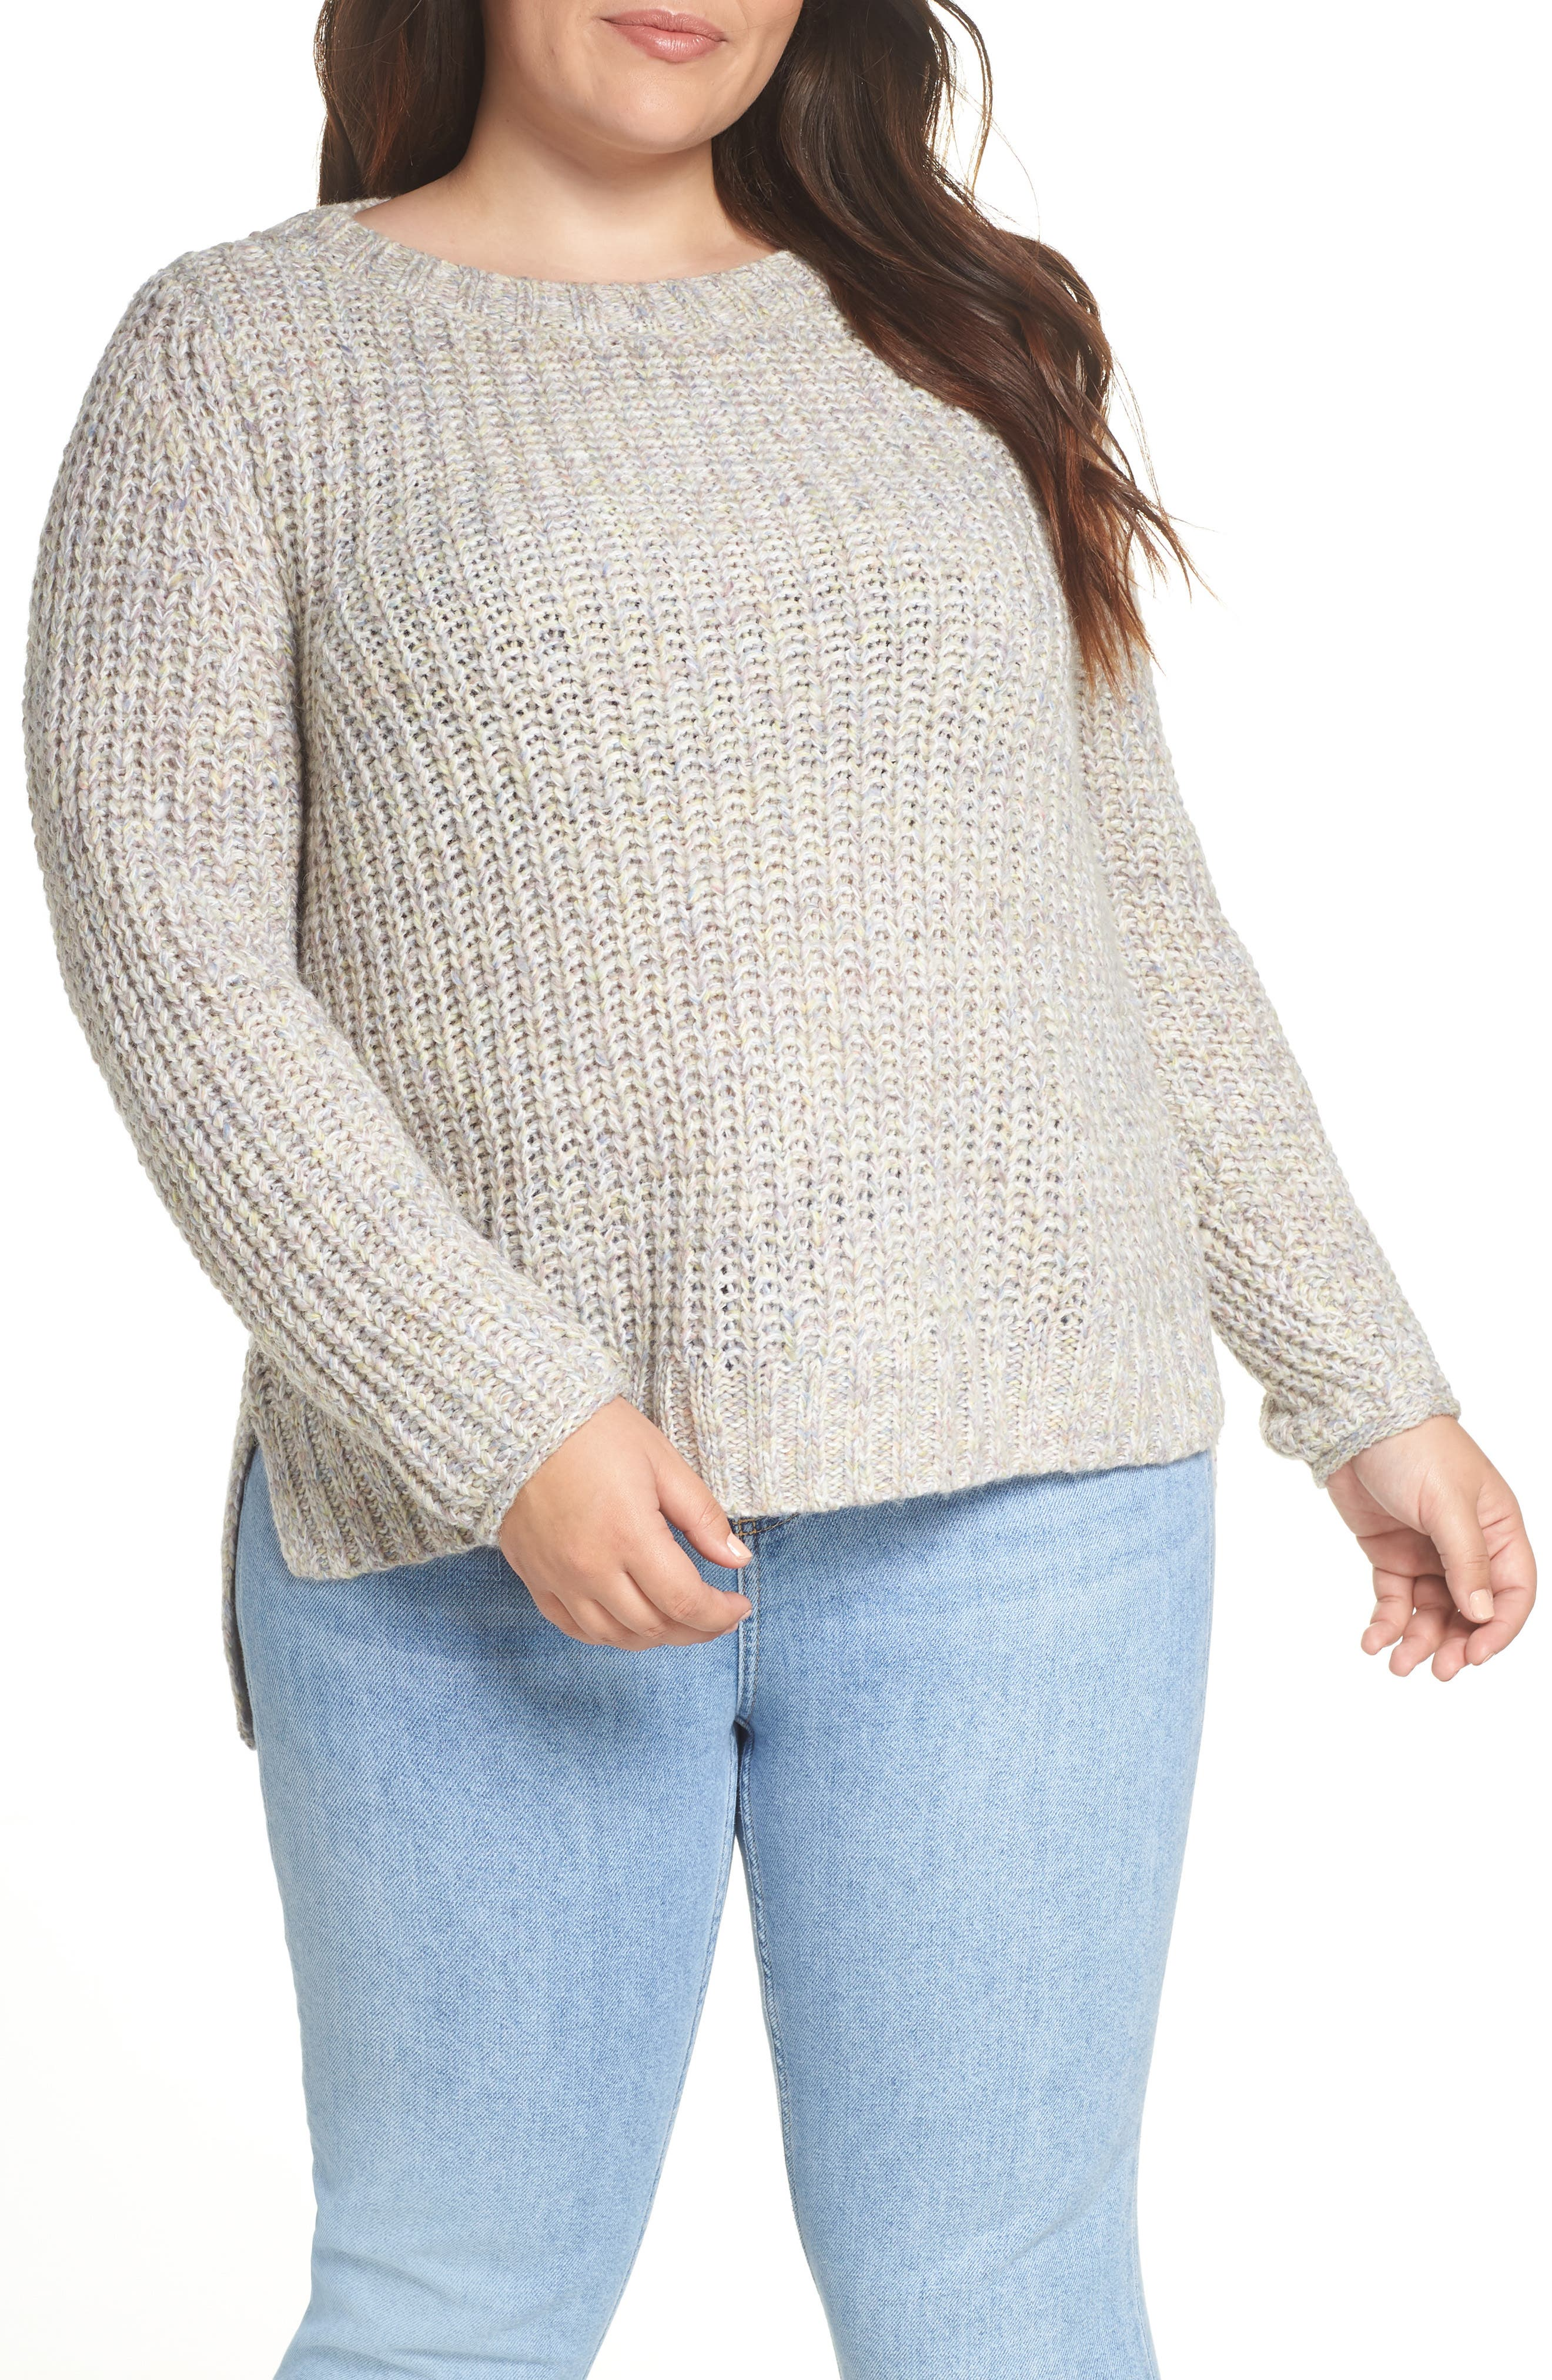 Boat Neck Sweater,                         Main,                         color, BEIGE POPCORN PATTERN